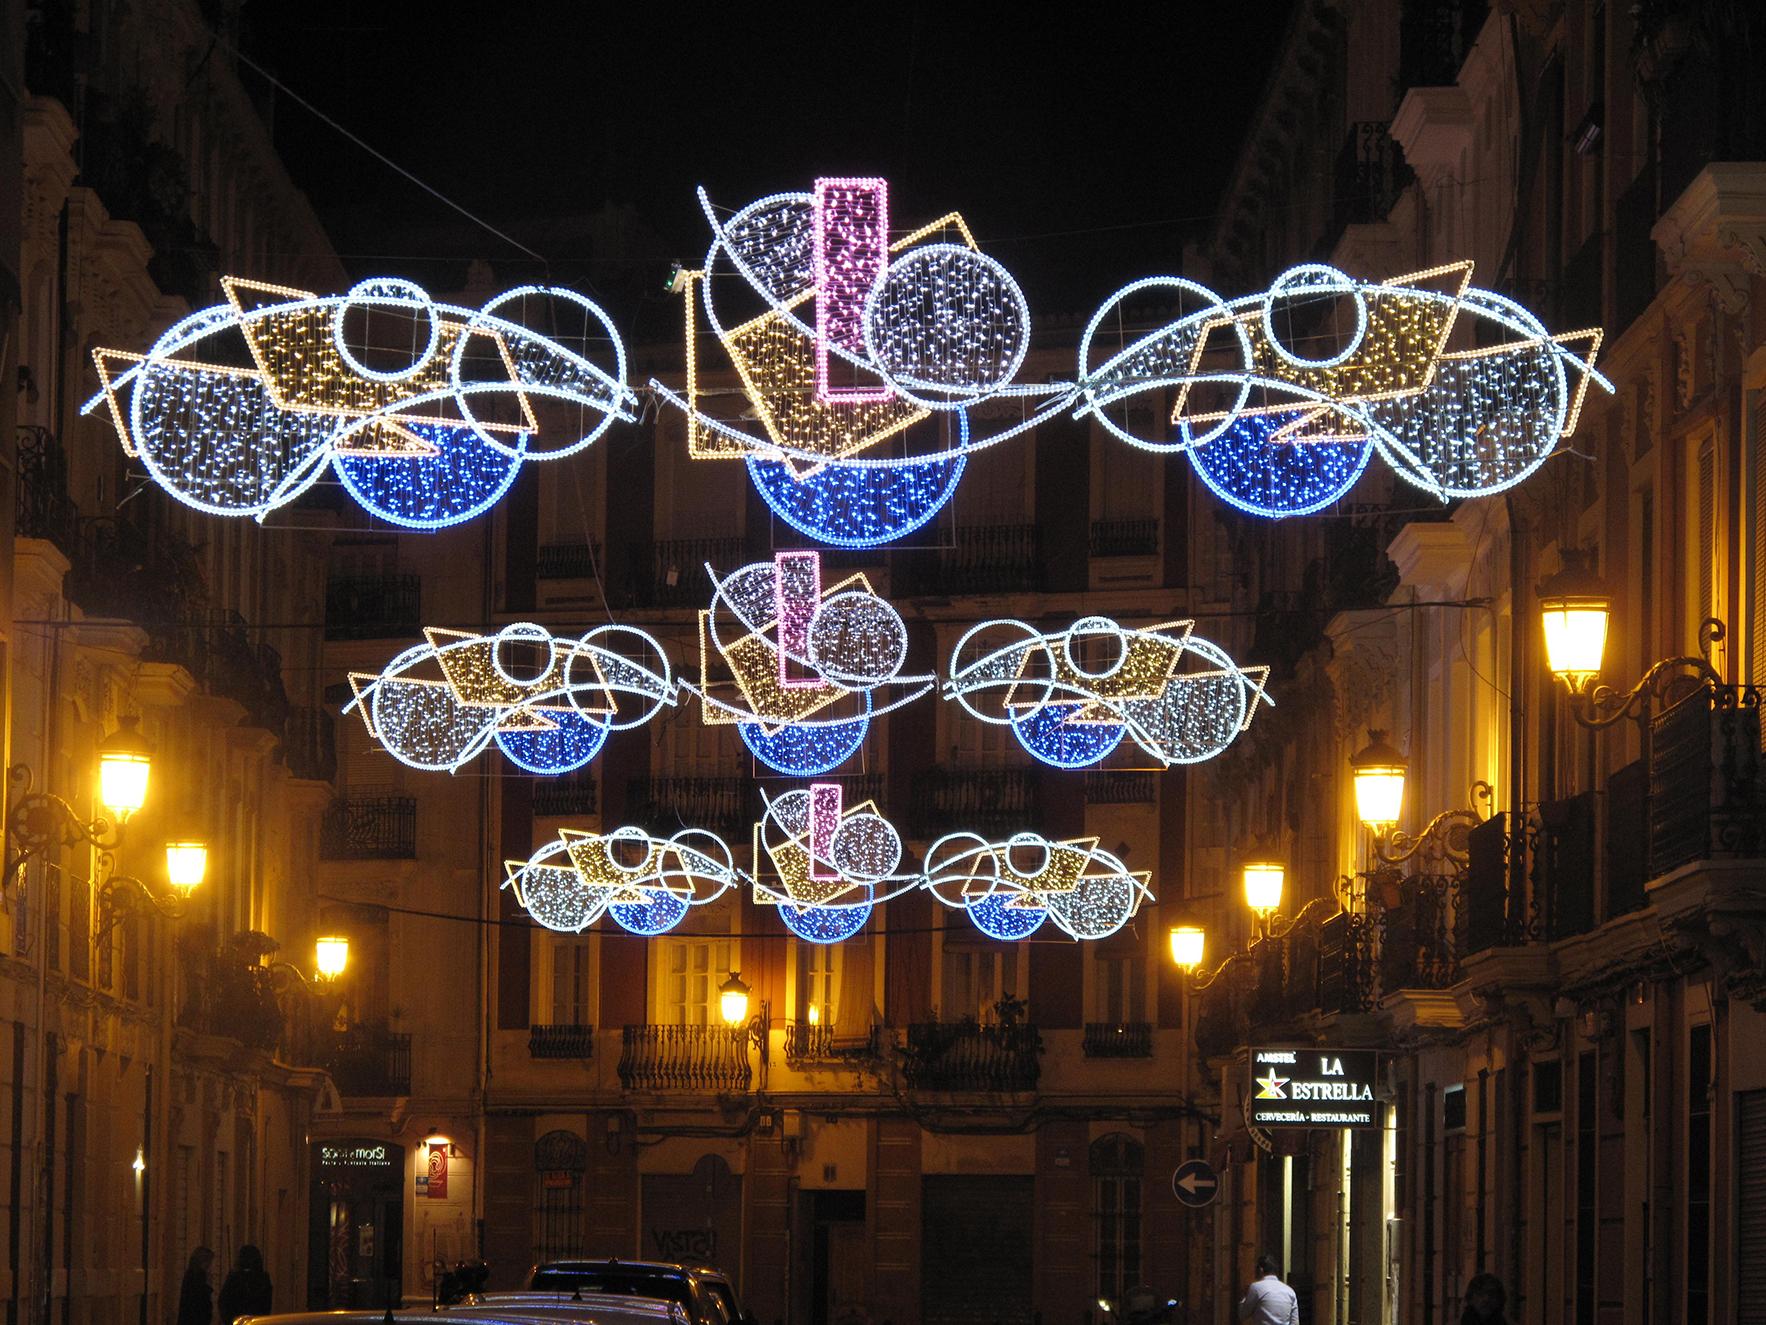 Elecfes Iluminaciones Fiesta 12